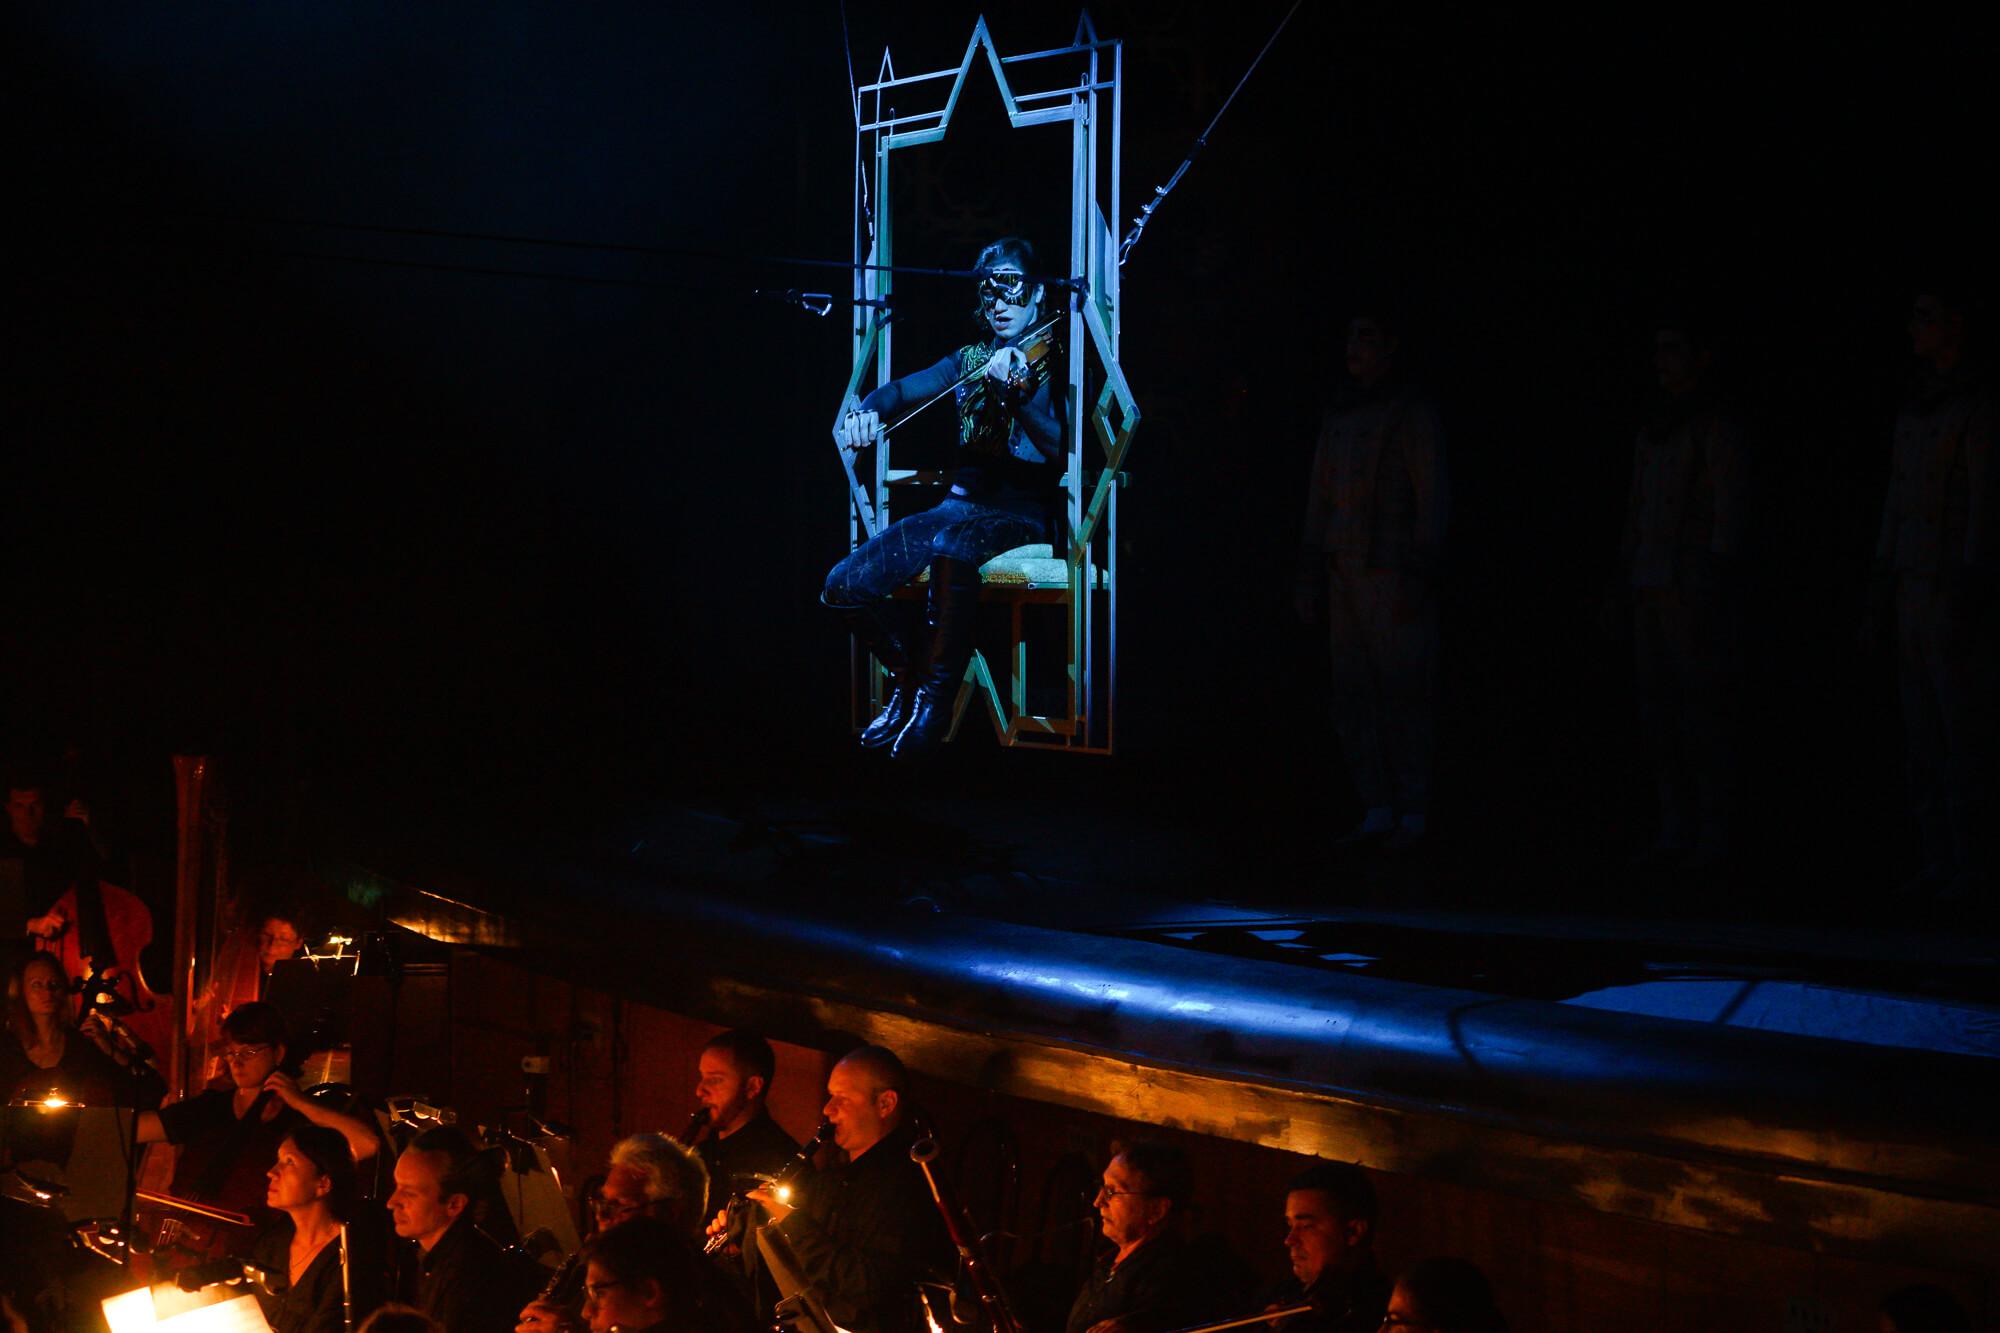 Премьера оперетты «Мистер Икс» в Краснодаре